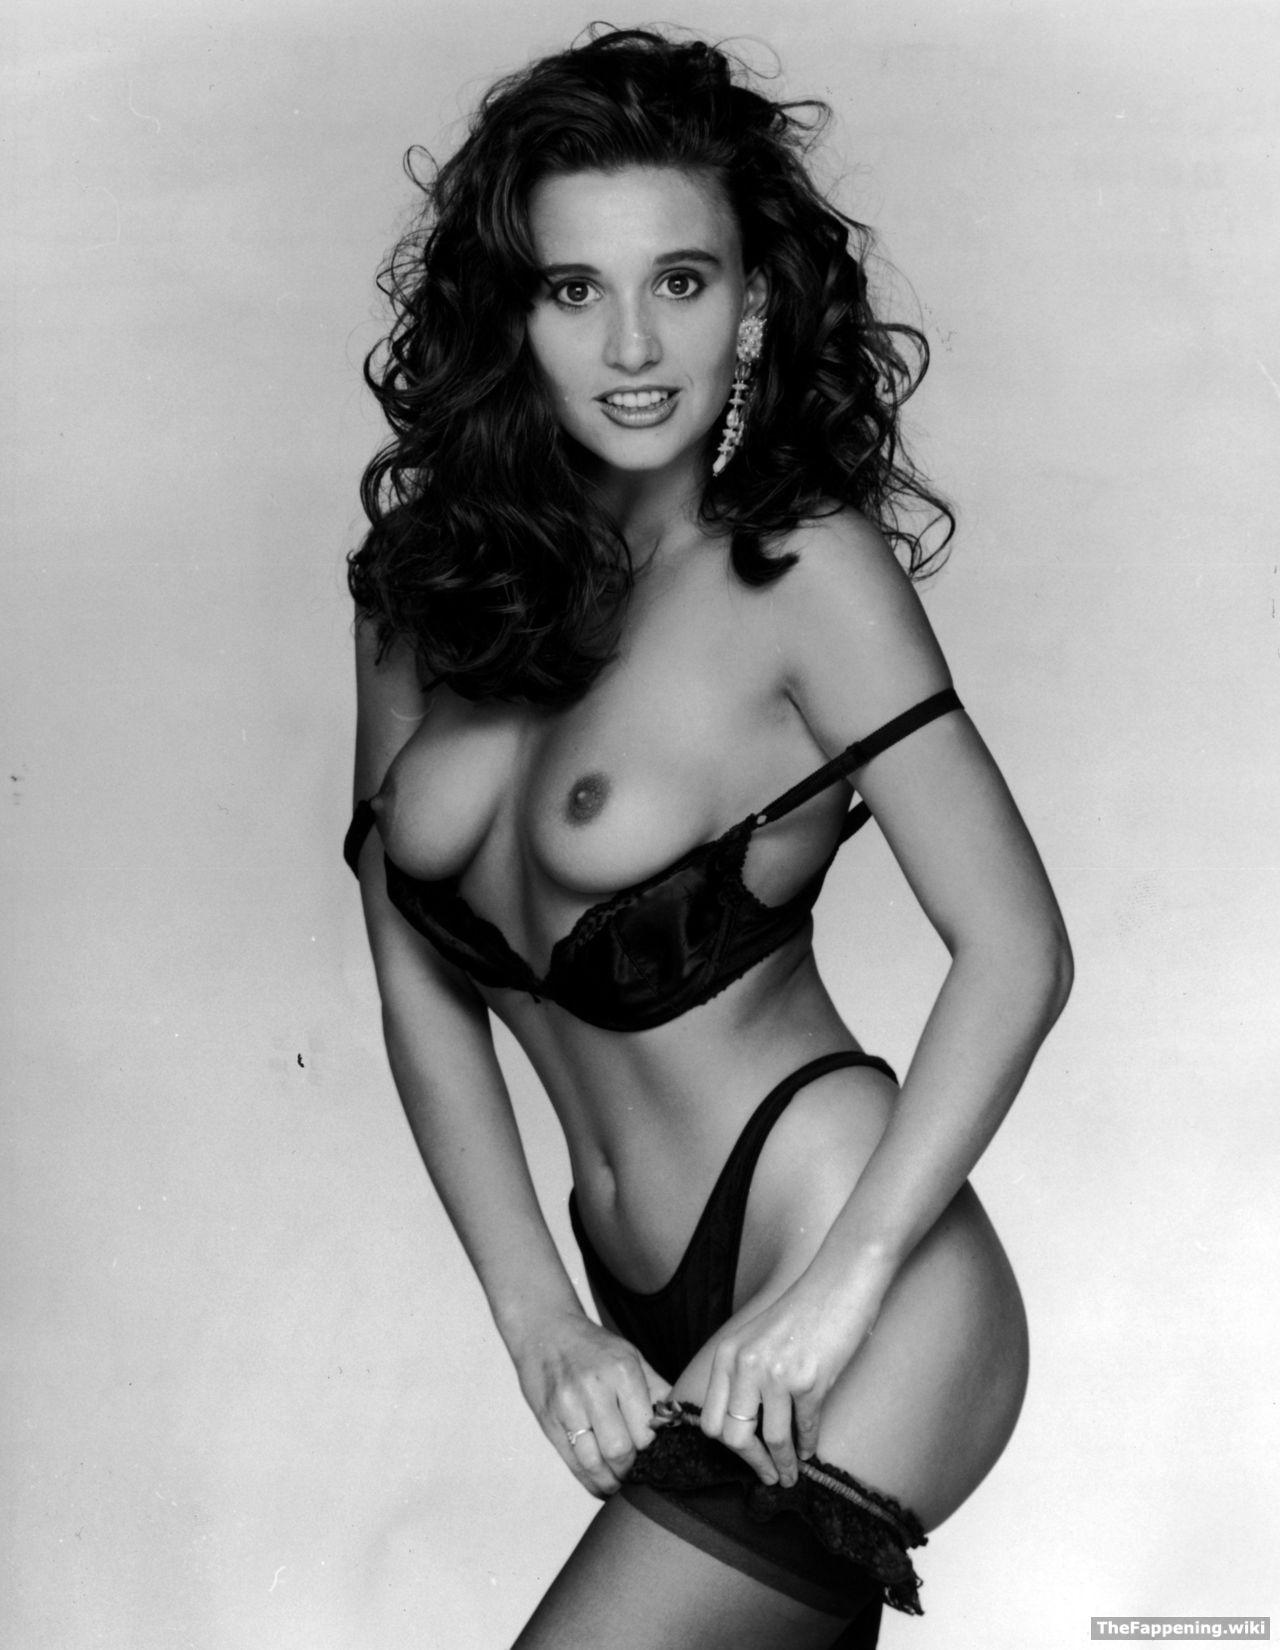 Barbara nude girl boy